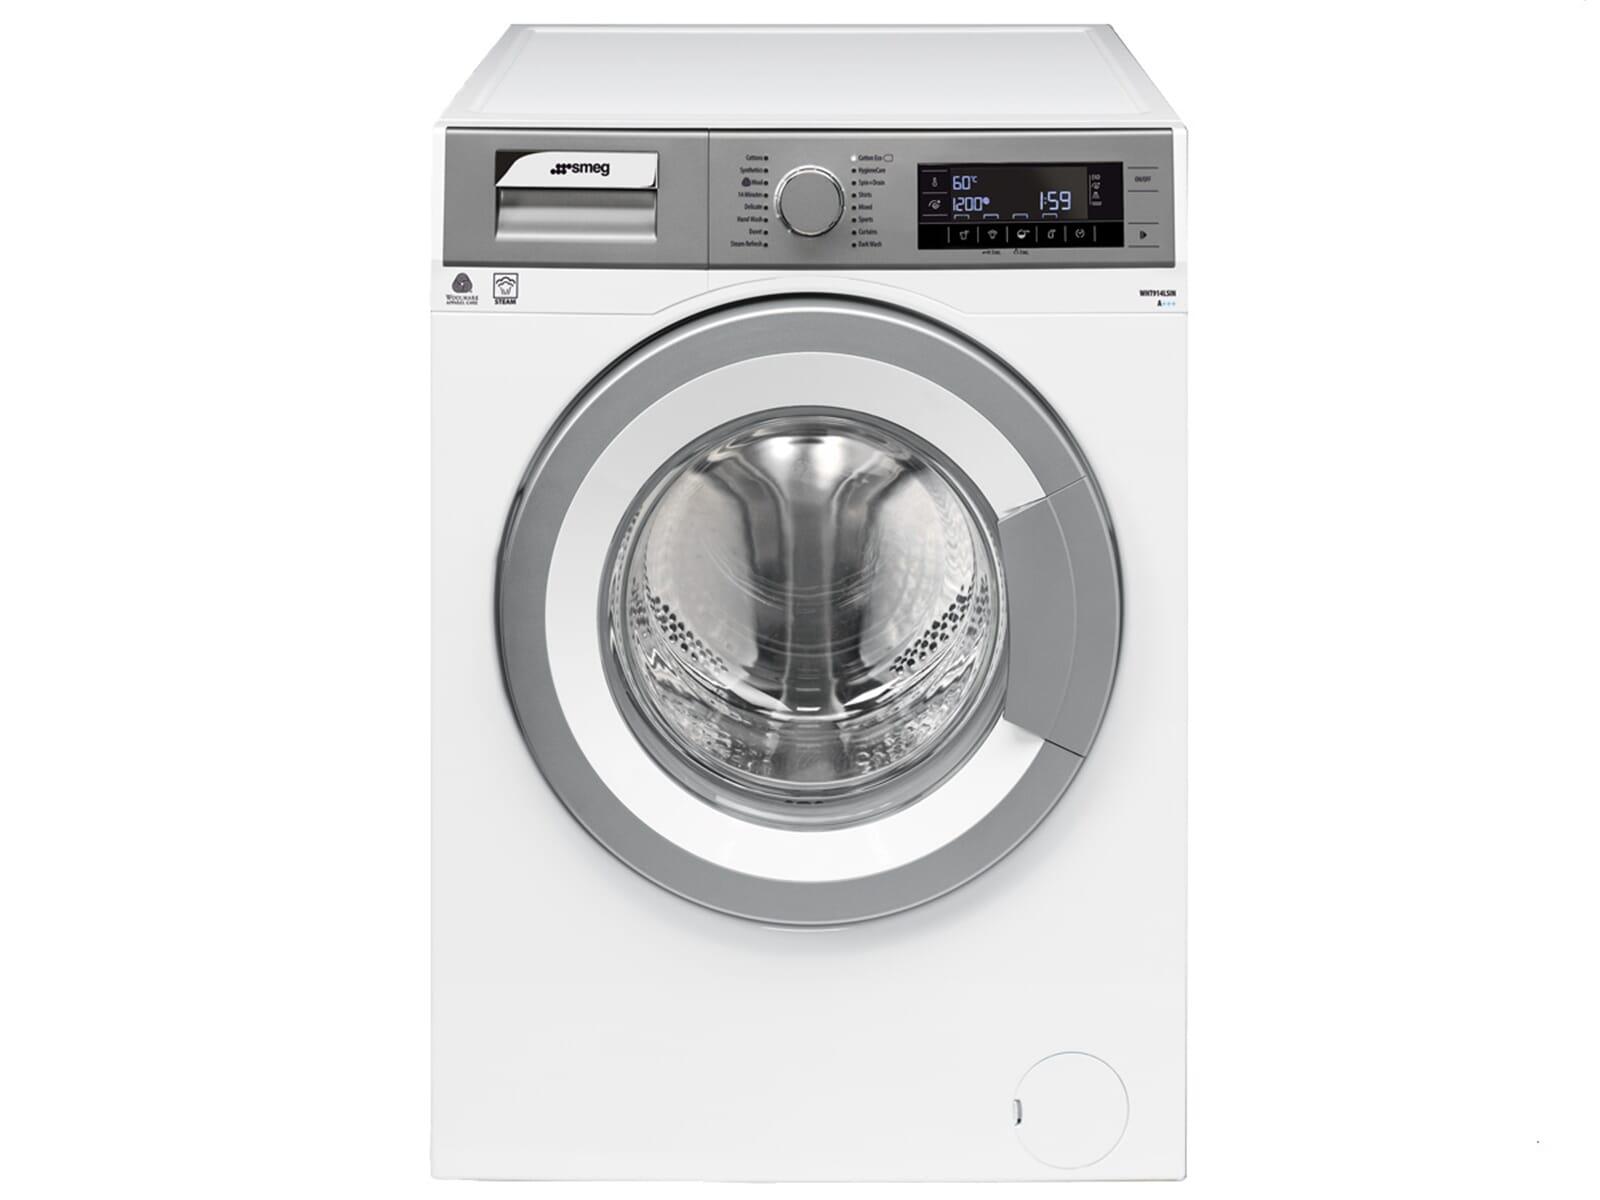 smeg wht914lsin stand waschmaschine wei wasch vollautomat frontlader a 9kg ebay. Black Bedroom Furniture Sets. Home Design Ideas